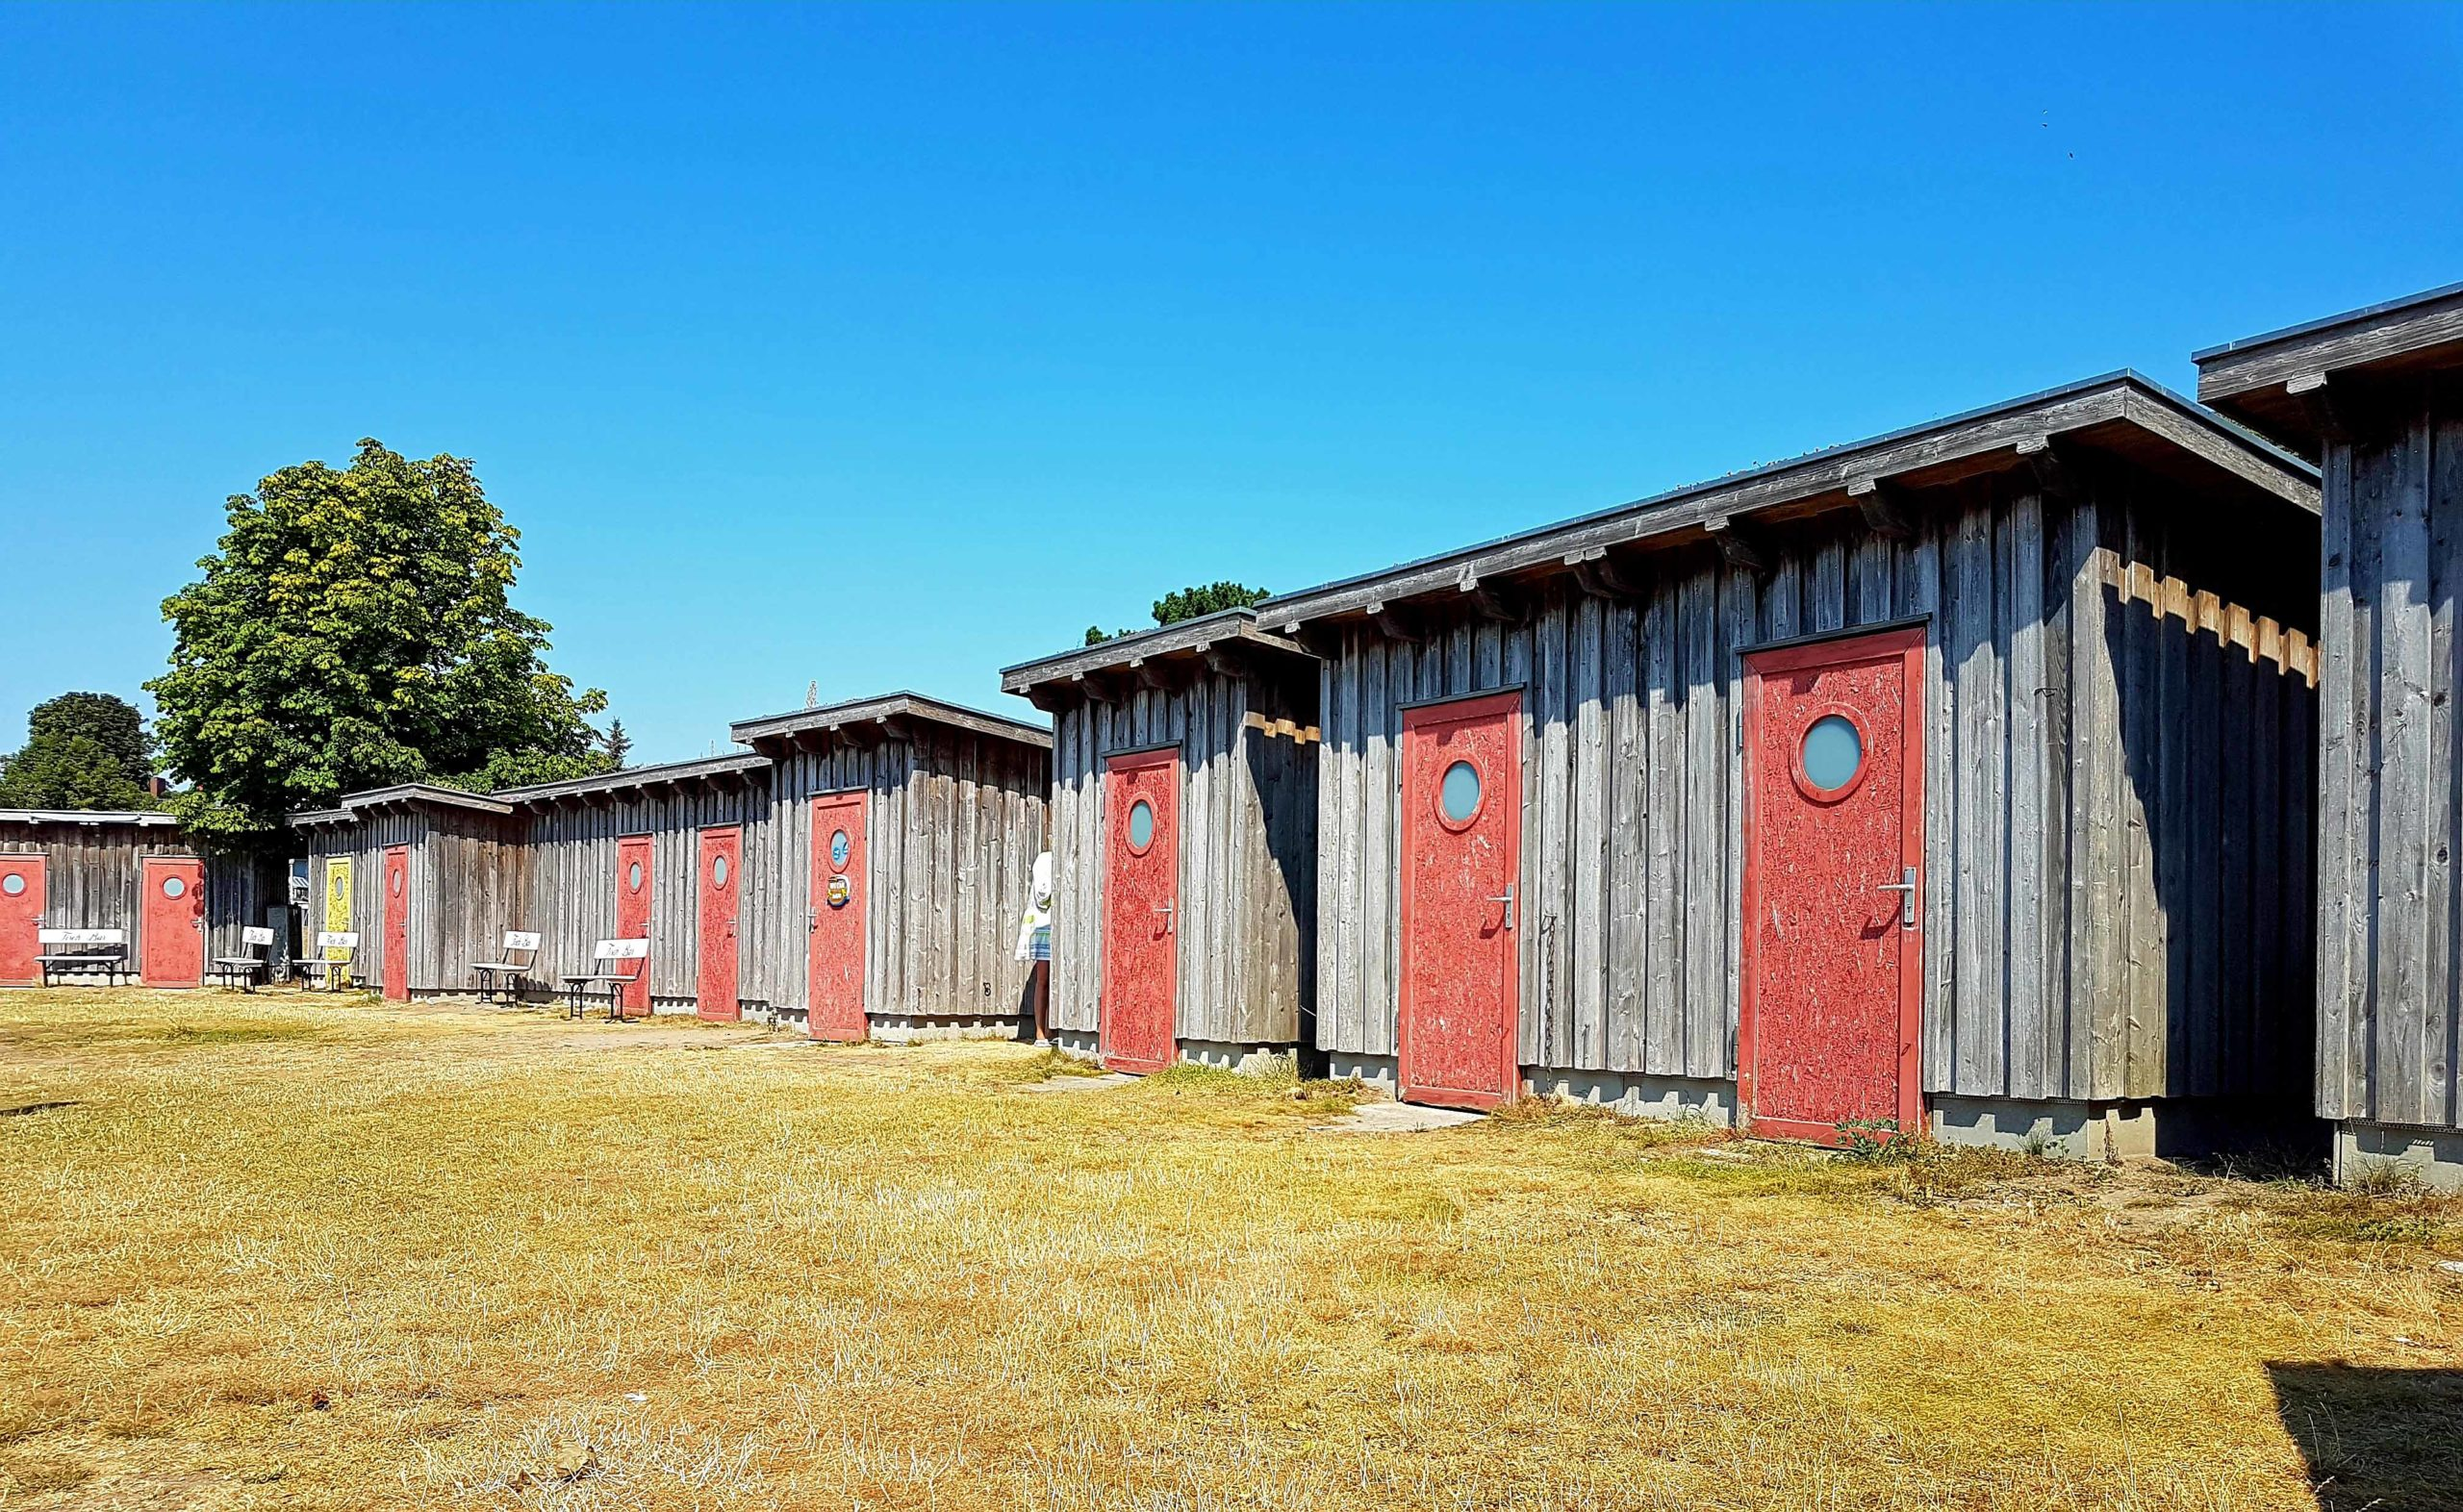 Niendorf Hütten mit roten Türen